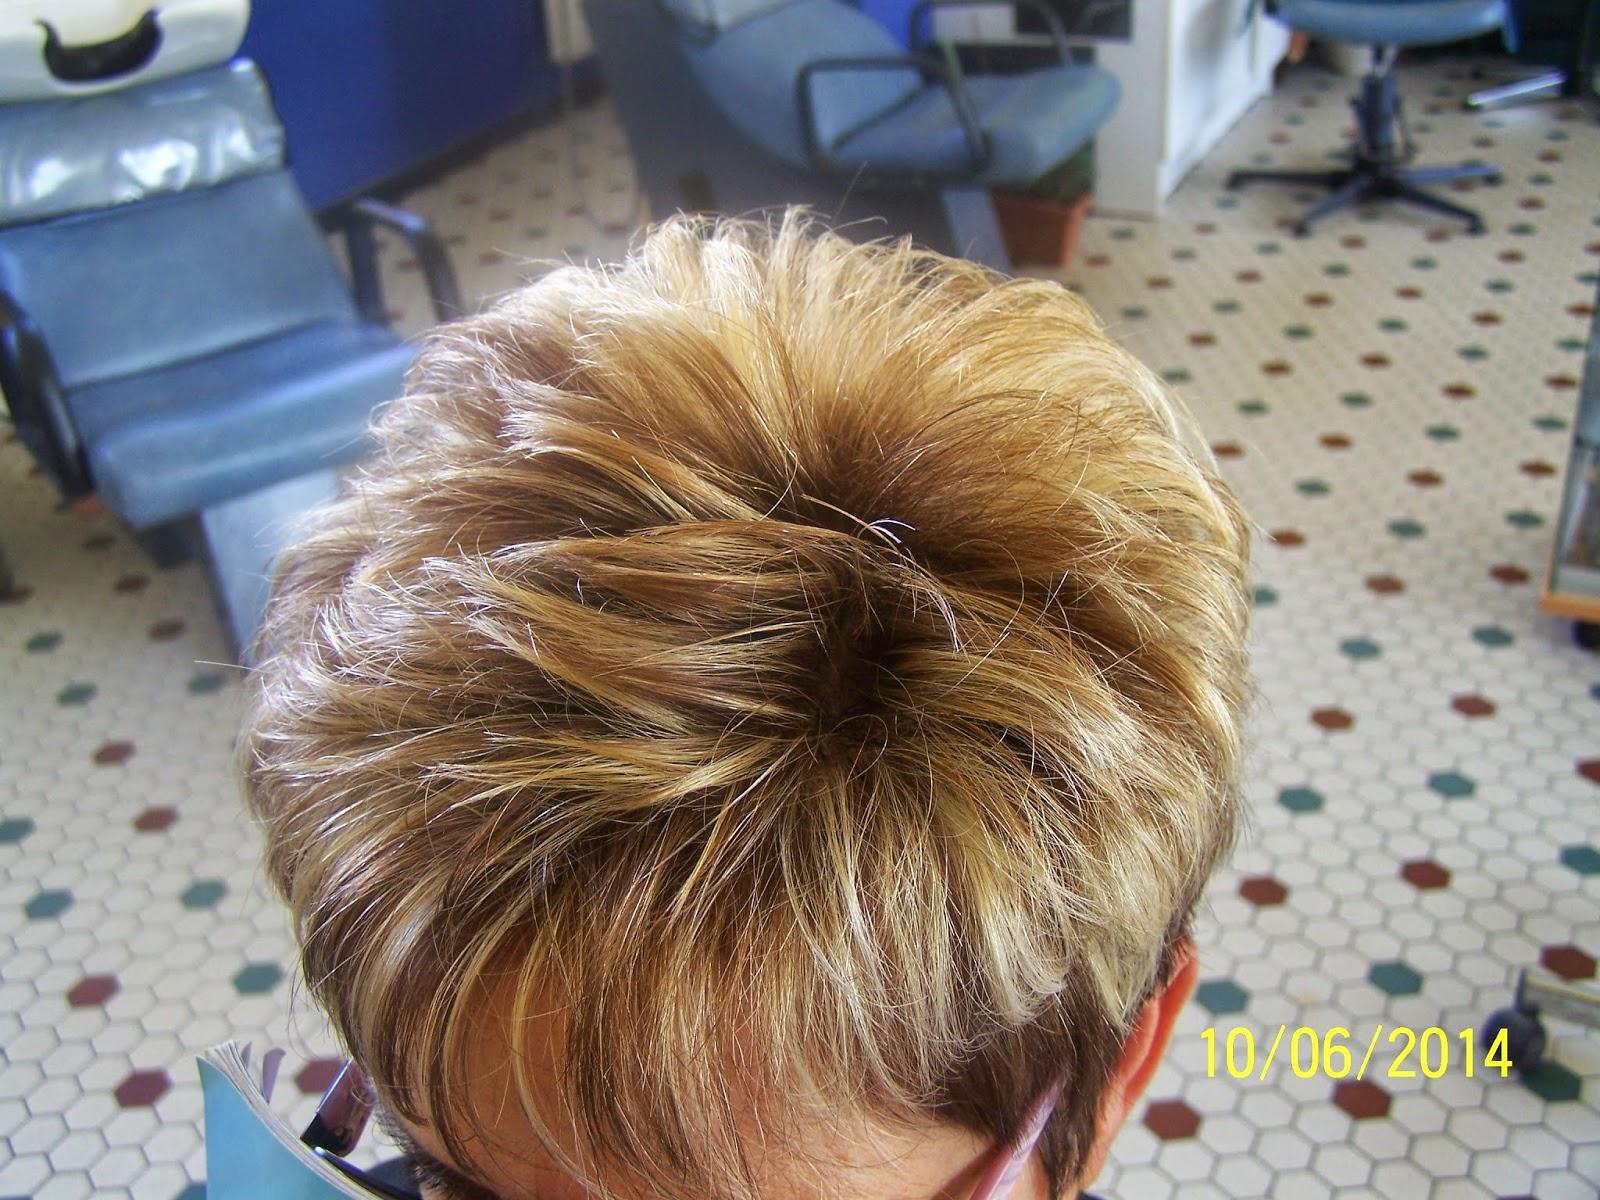 BENEDICTE COIFFURE MIXTE Coupe Dame Sur Cheveux Court  Coloru00e9s Et Mu00e8chu00e9s